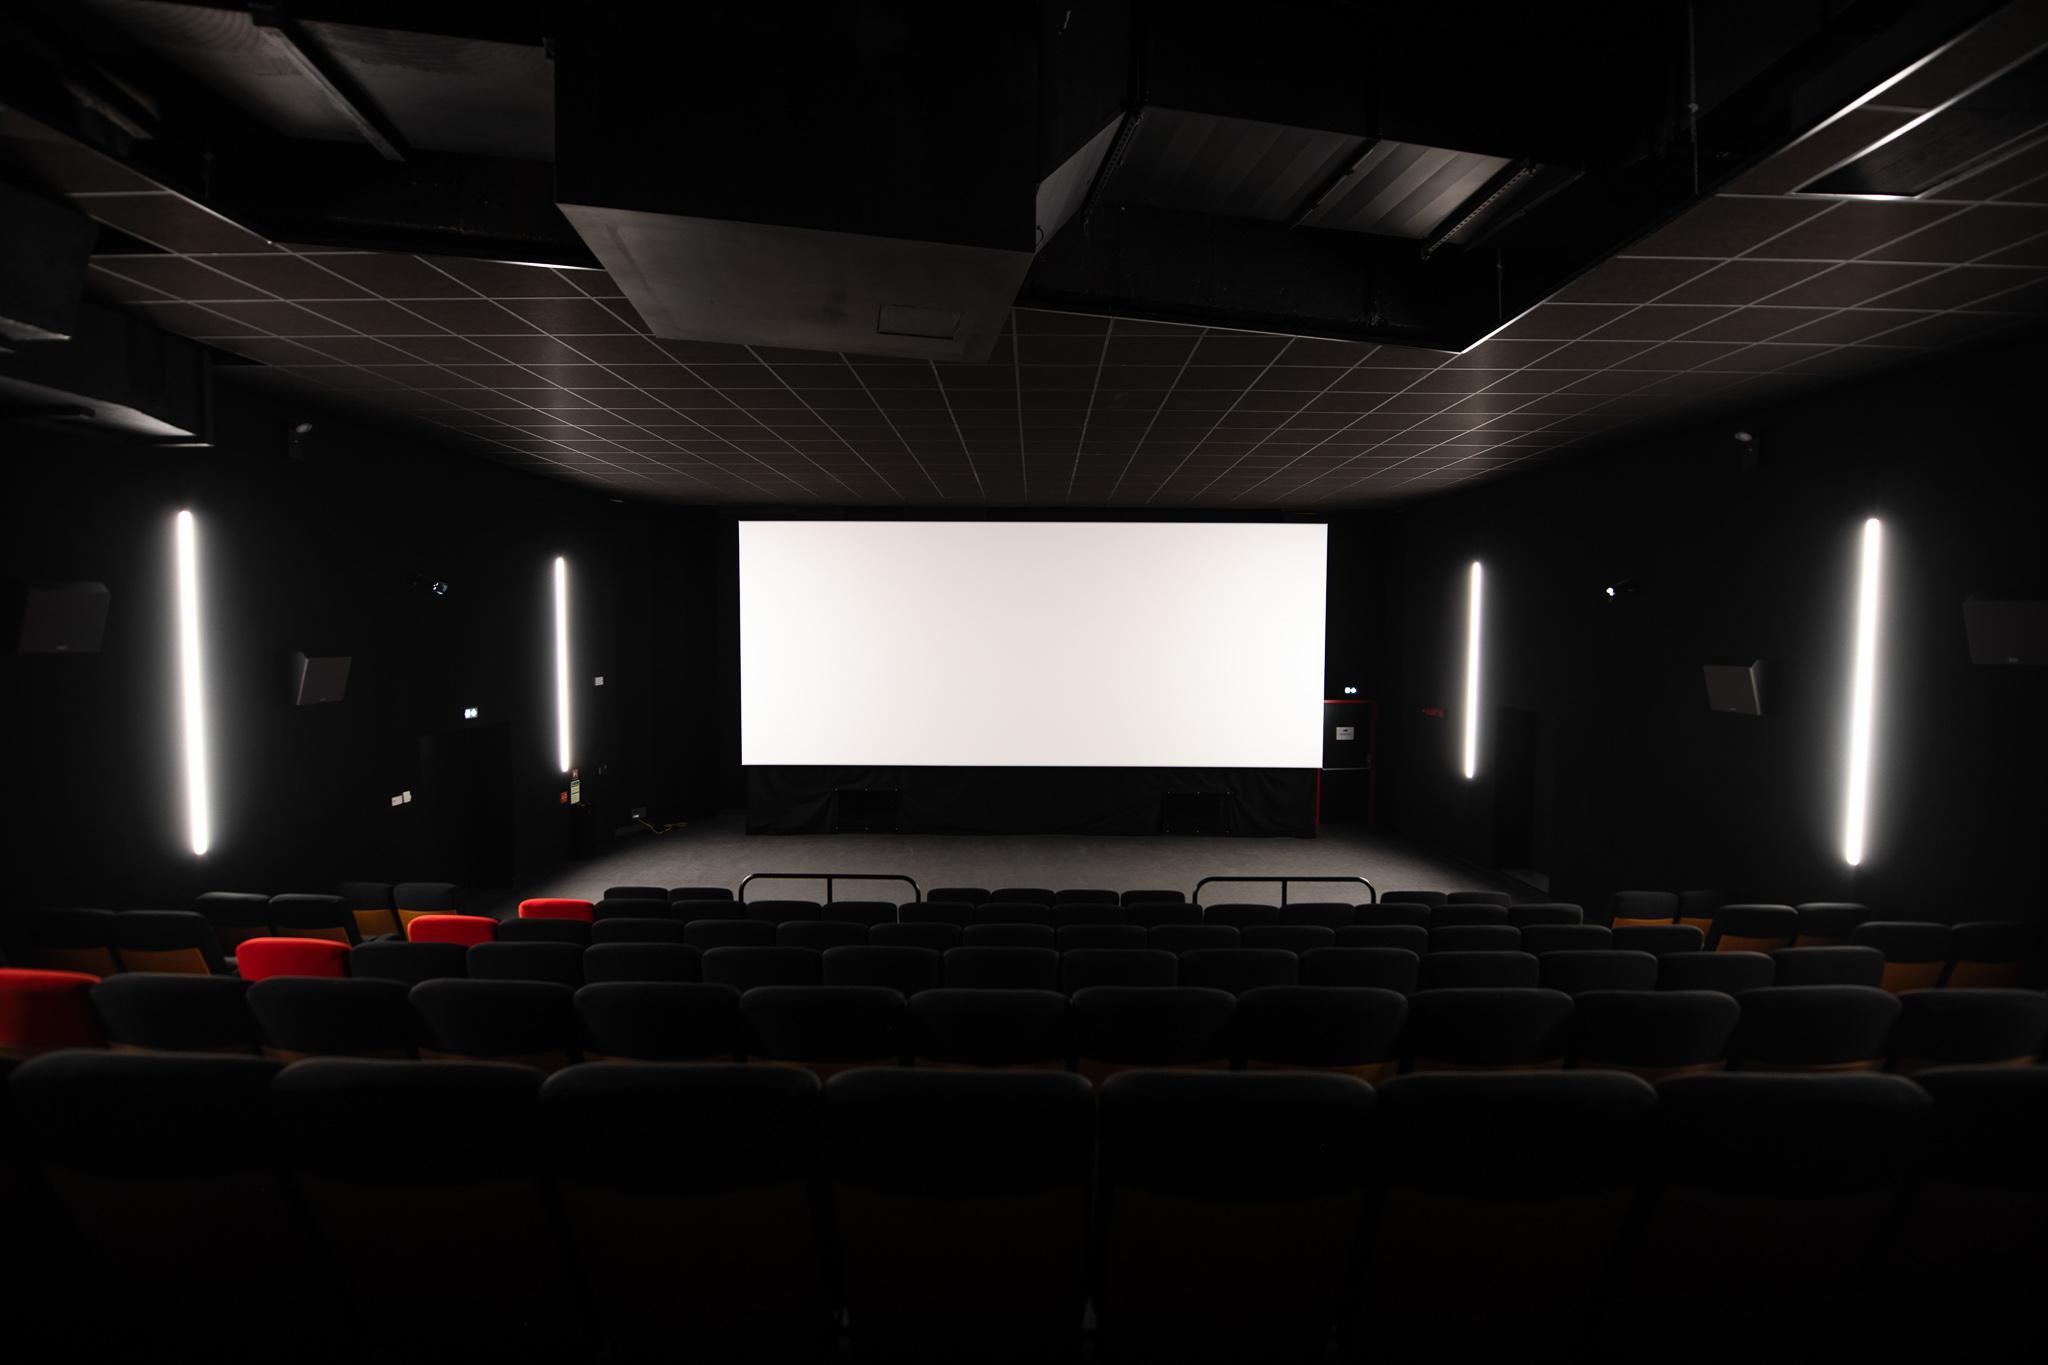 Cinéma Arvor_©YLM Picture_11052021_DSC_4437